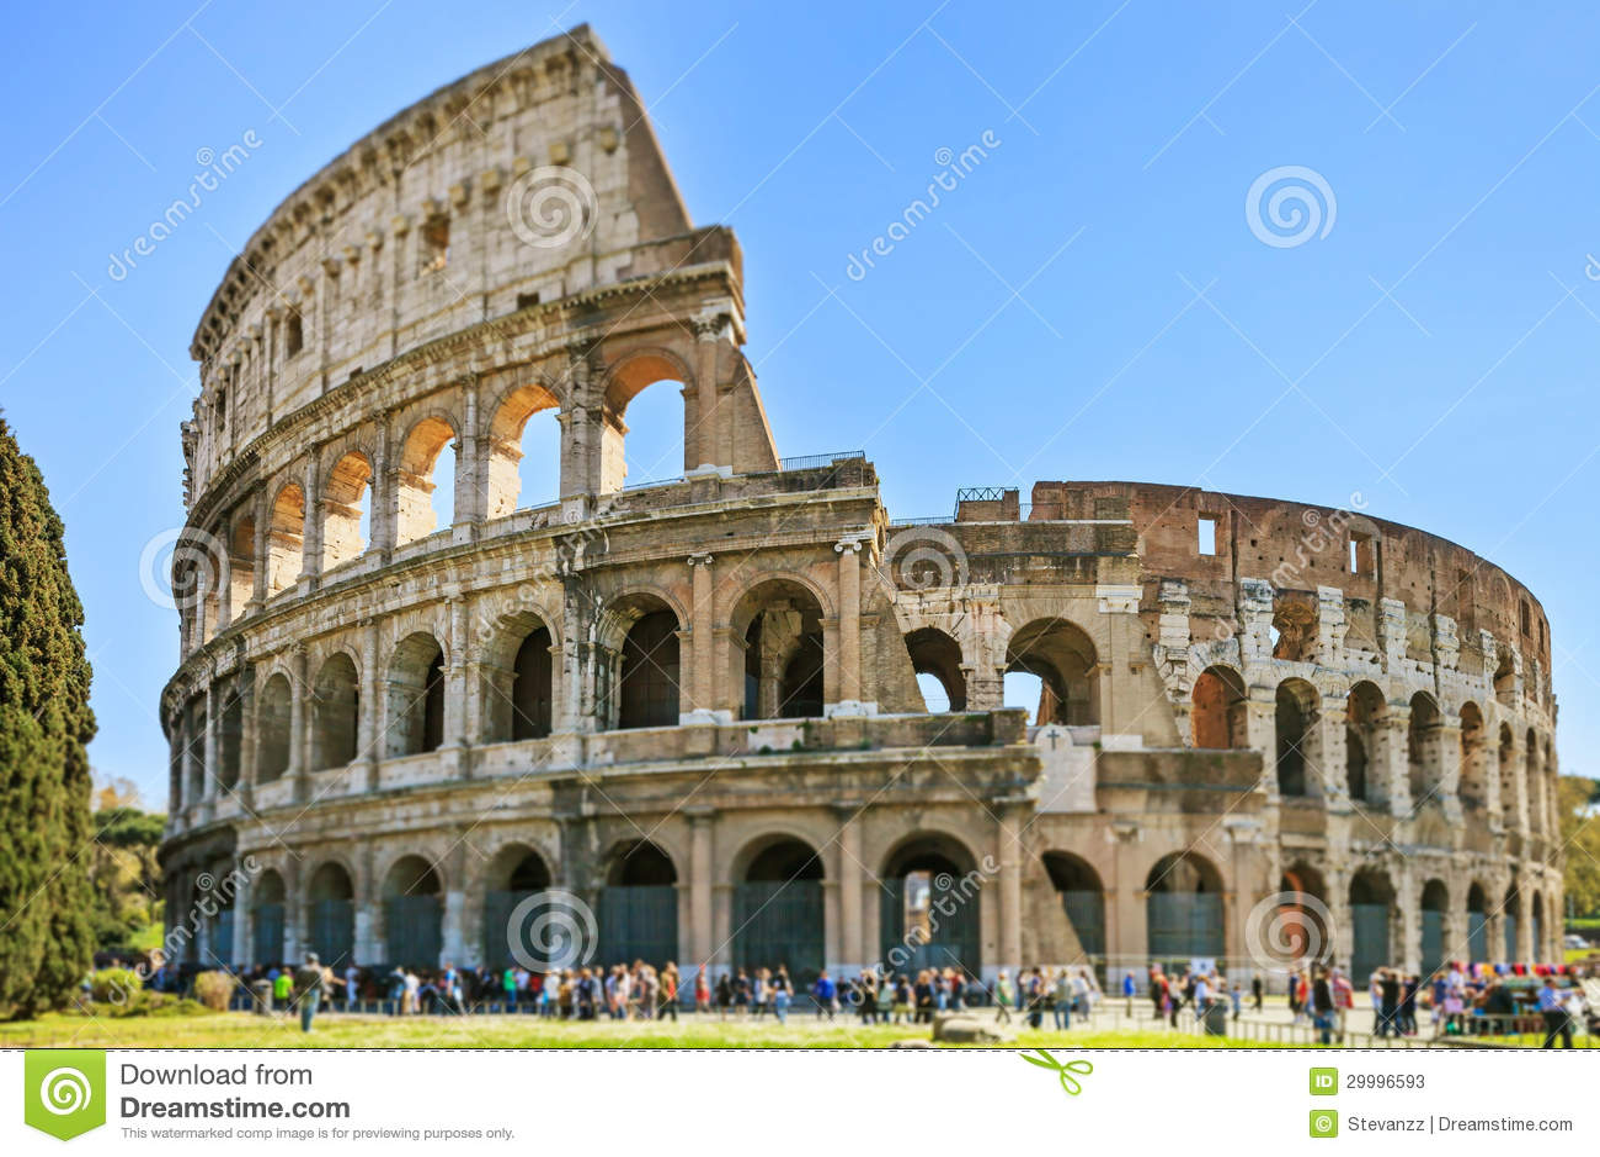 Римский наземный ориентир зодчества Colosseum в съемке переноса наклона. Рим, Италия